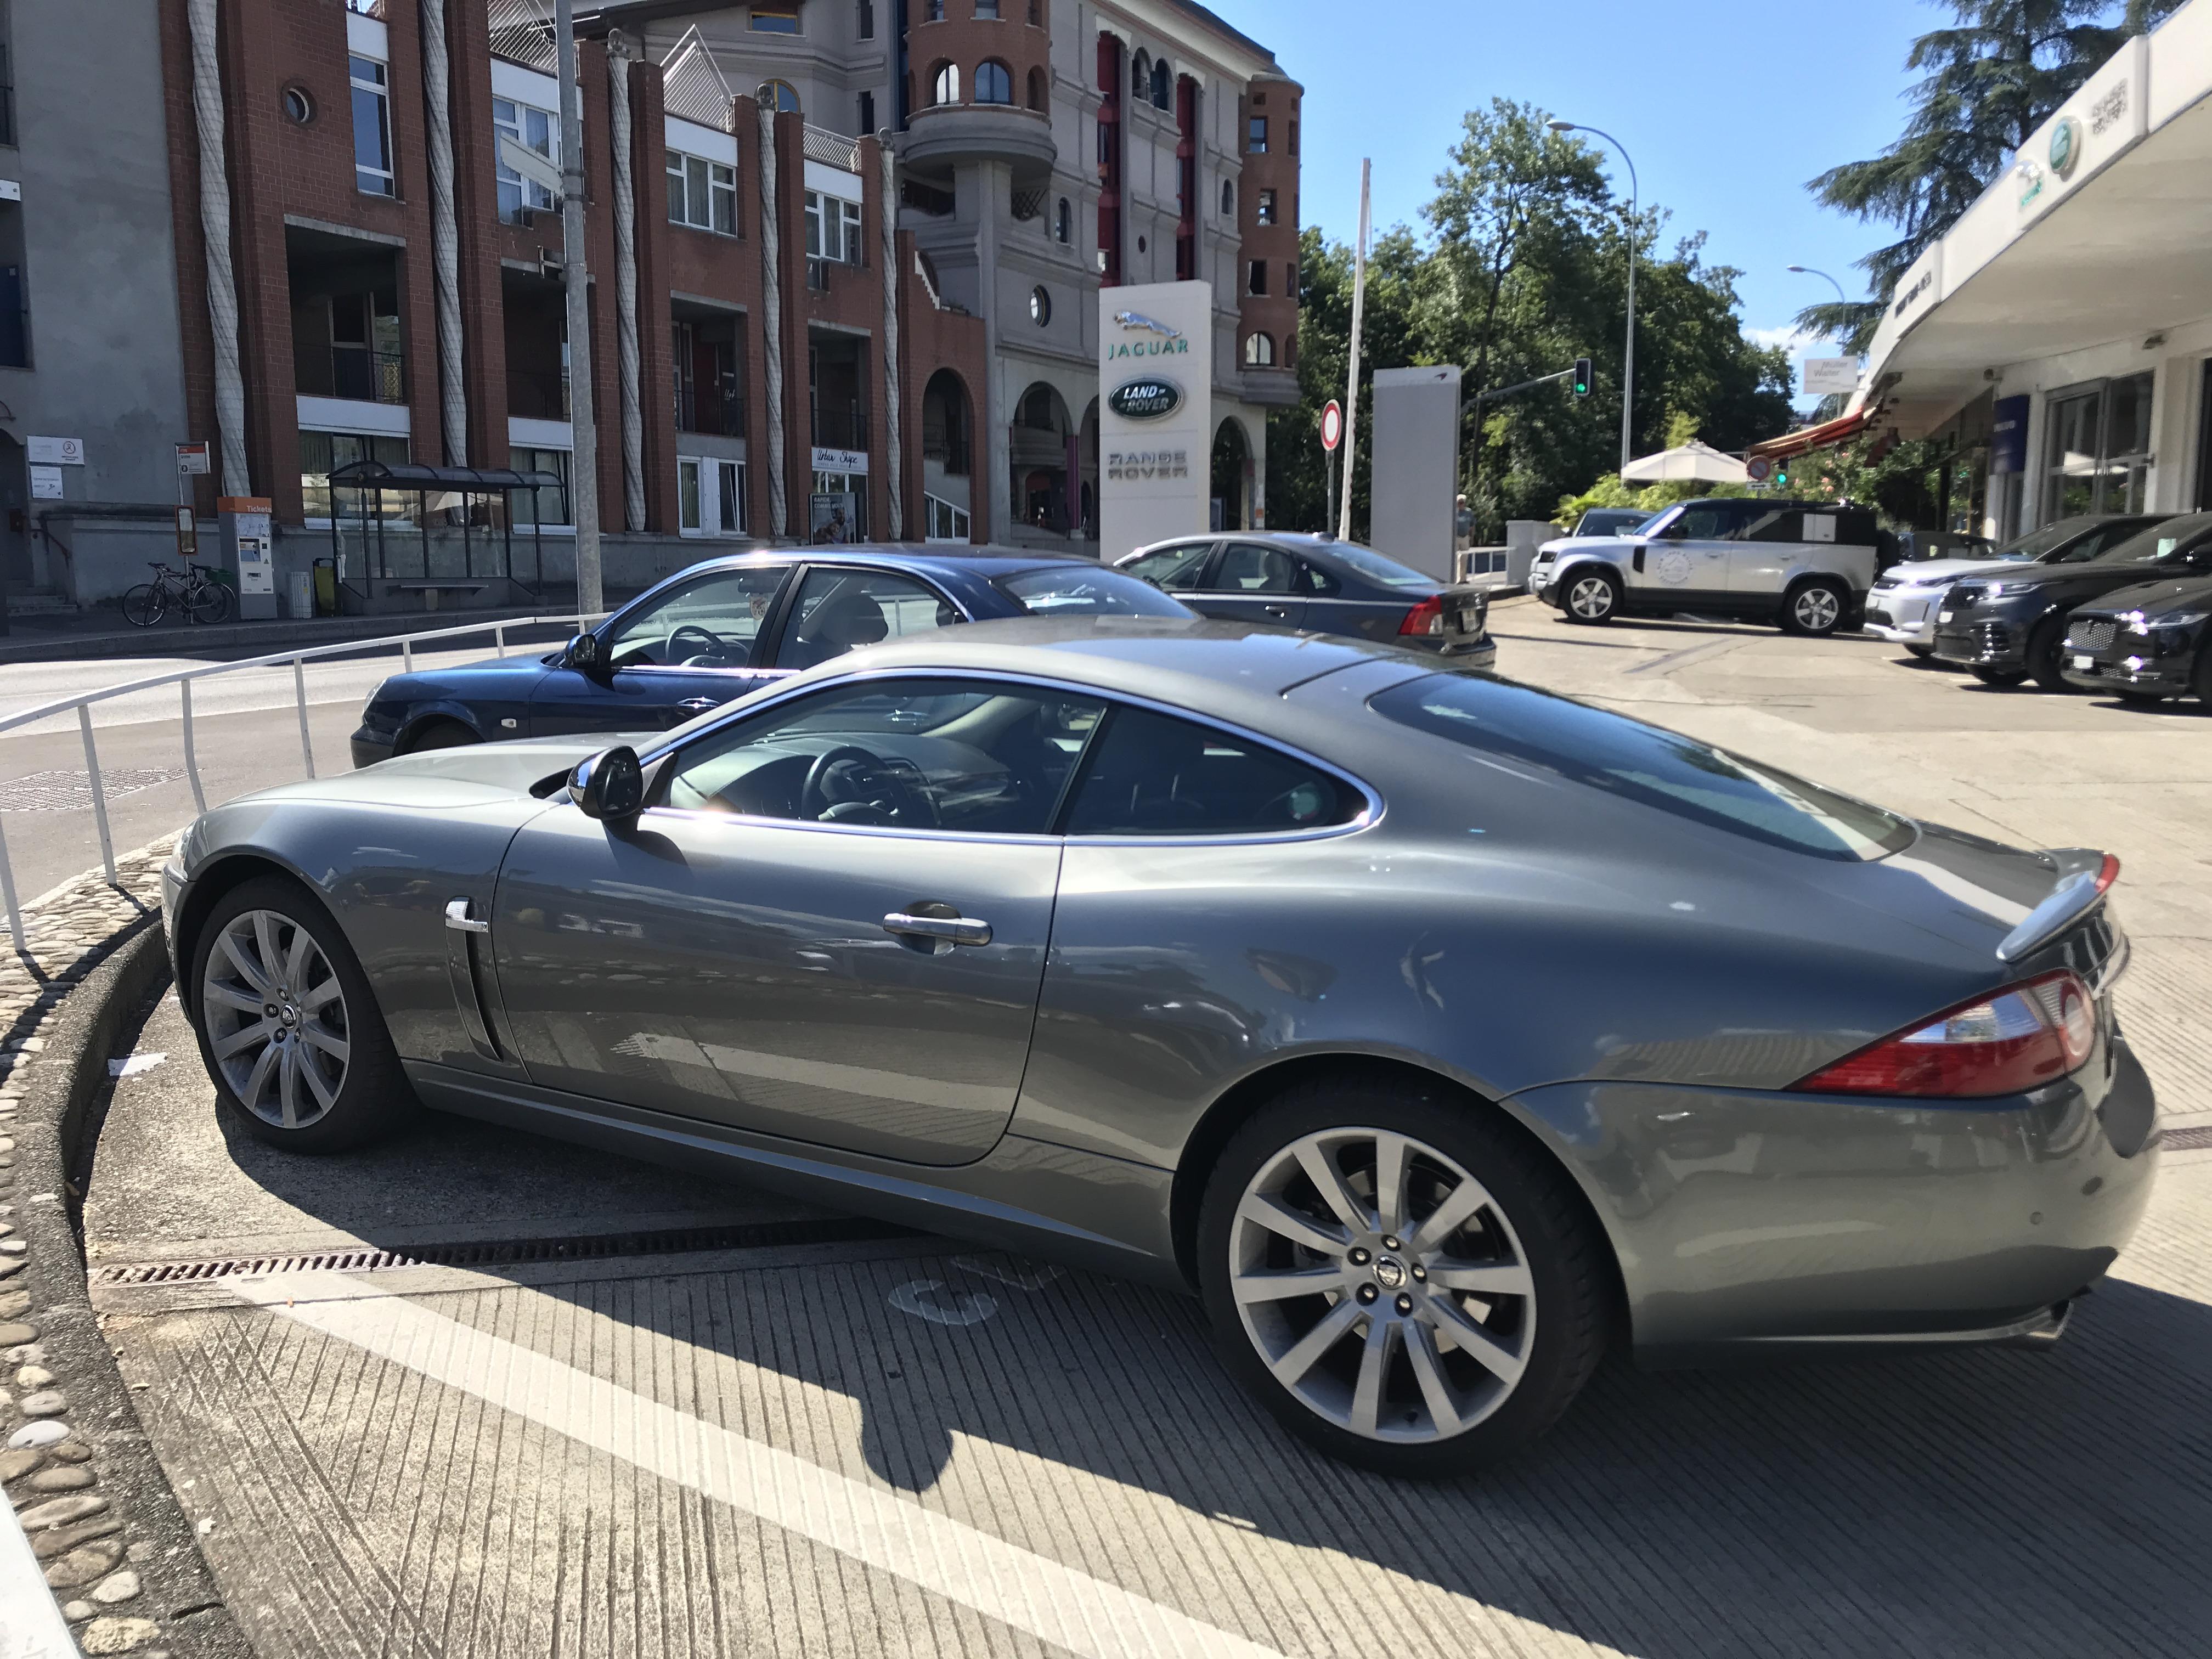 sportscar Jaguar XK Coupé 4.2 V8